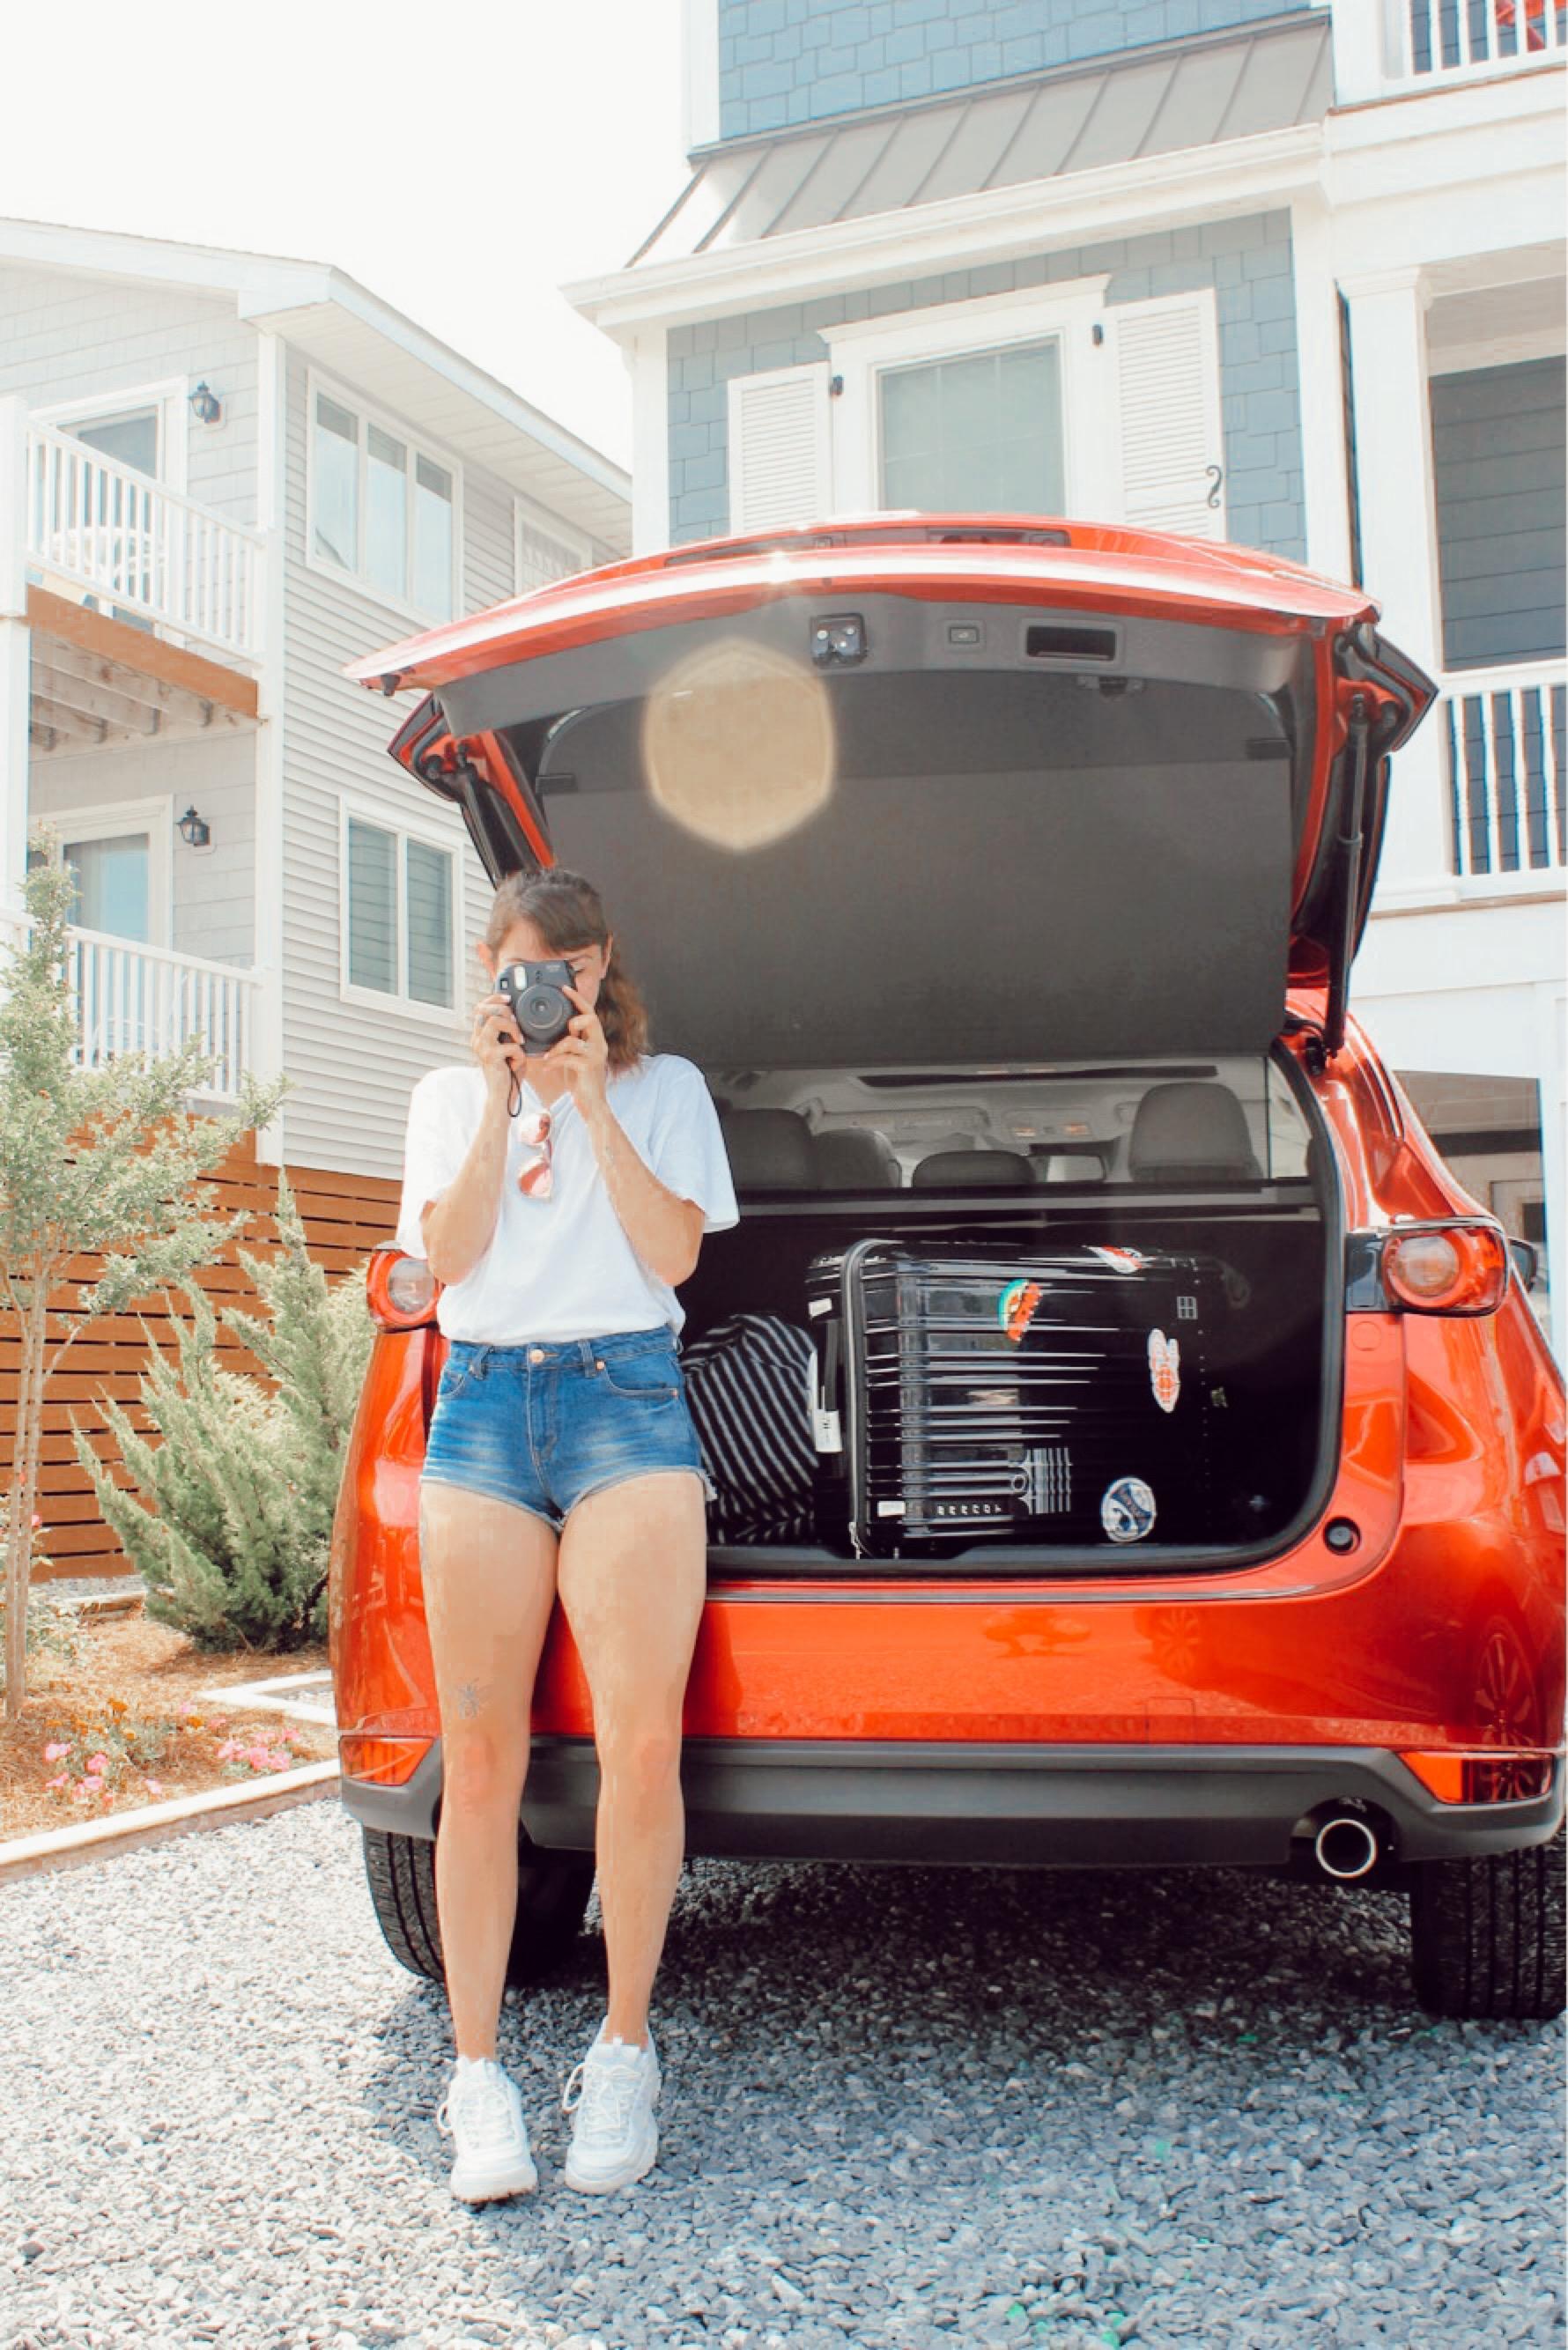 Beach Trip with the NEW super roomy Mazda CX-5